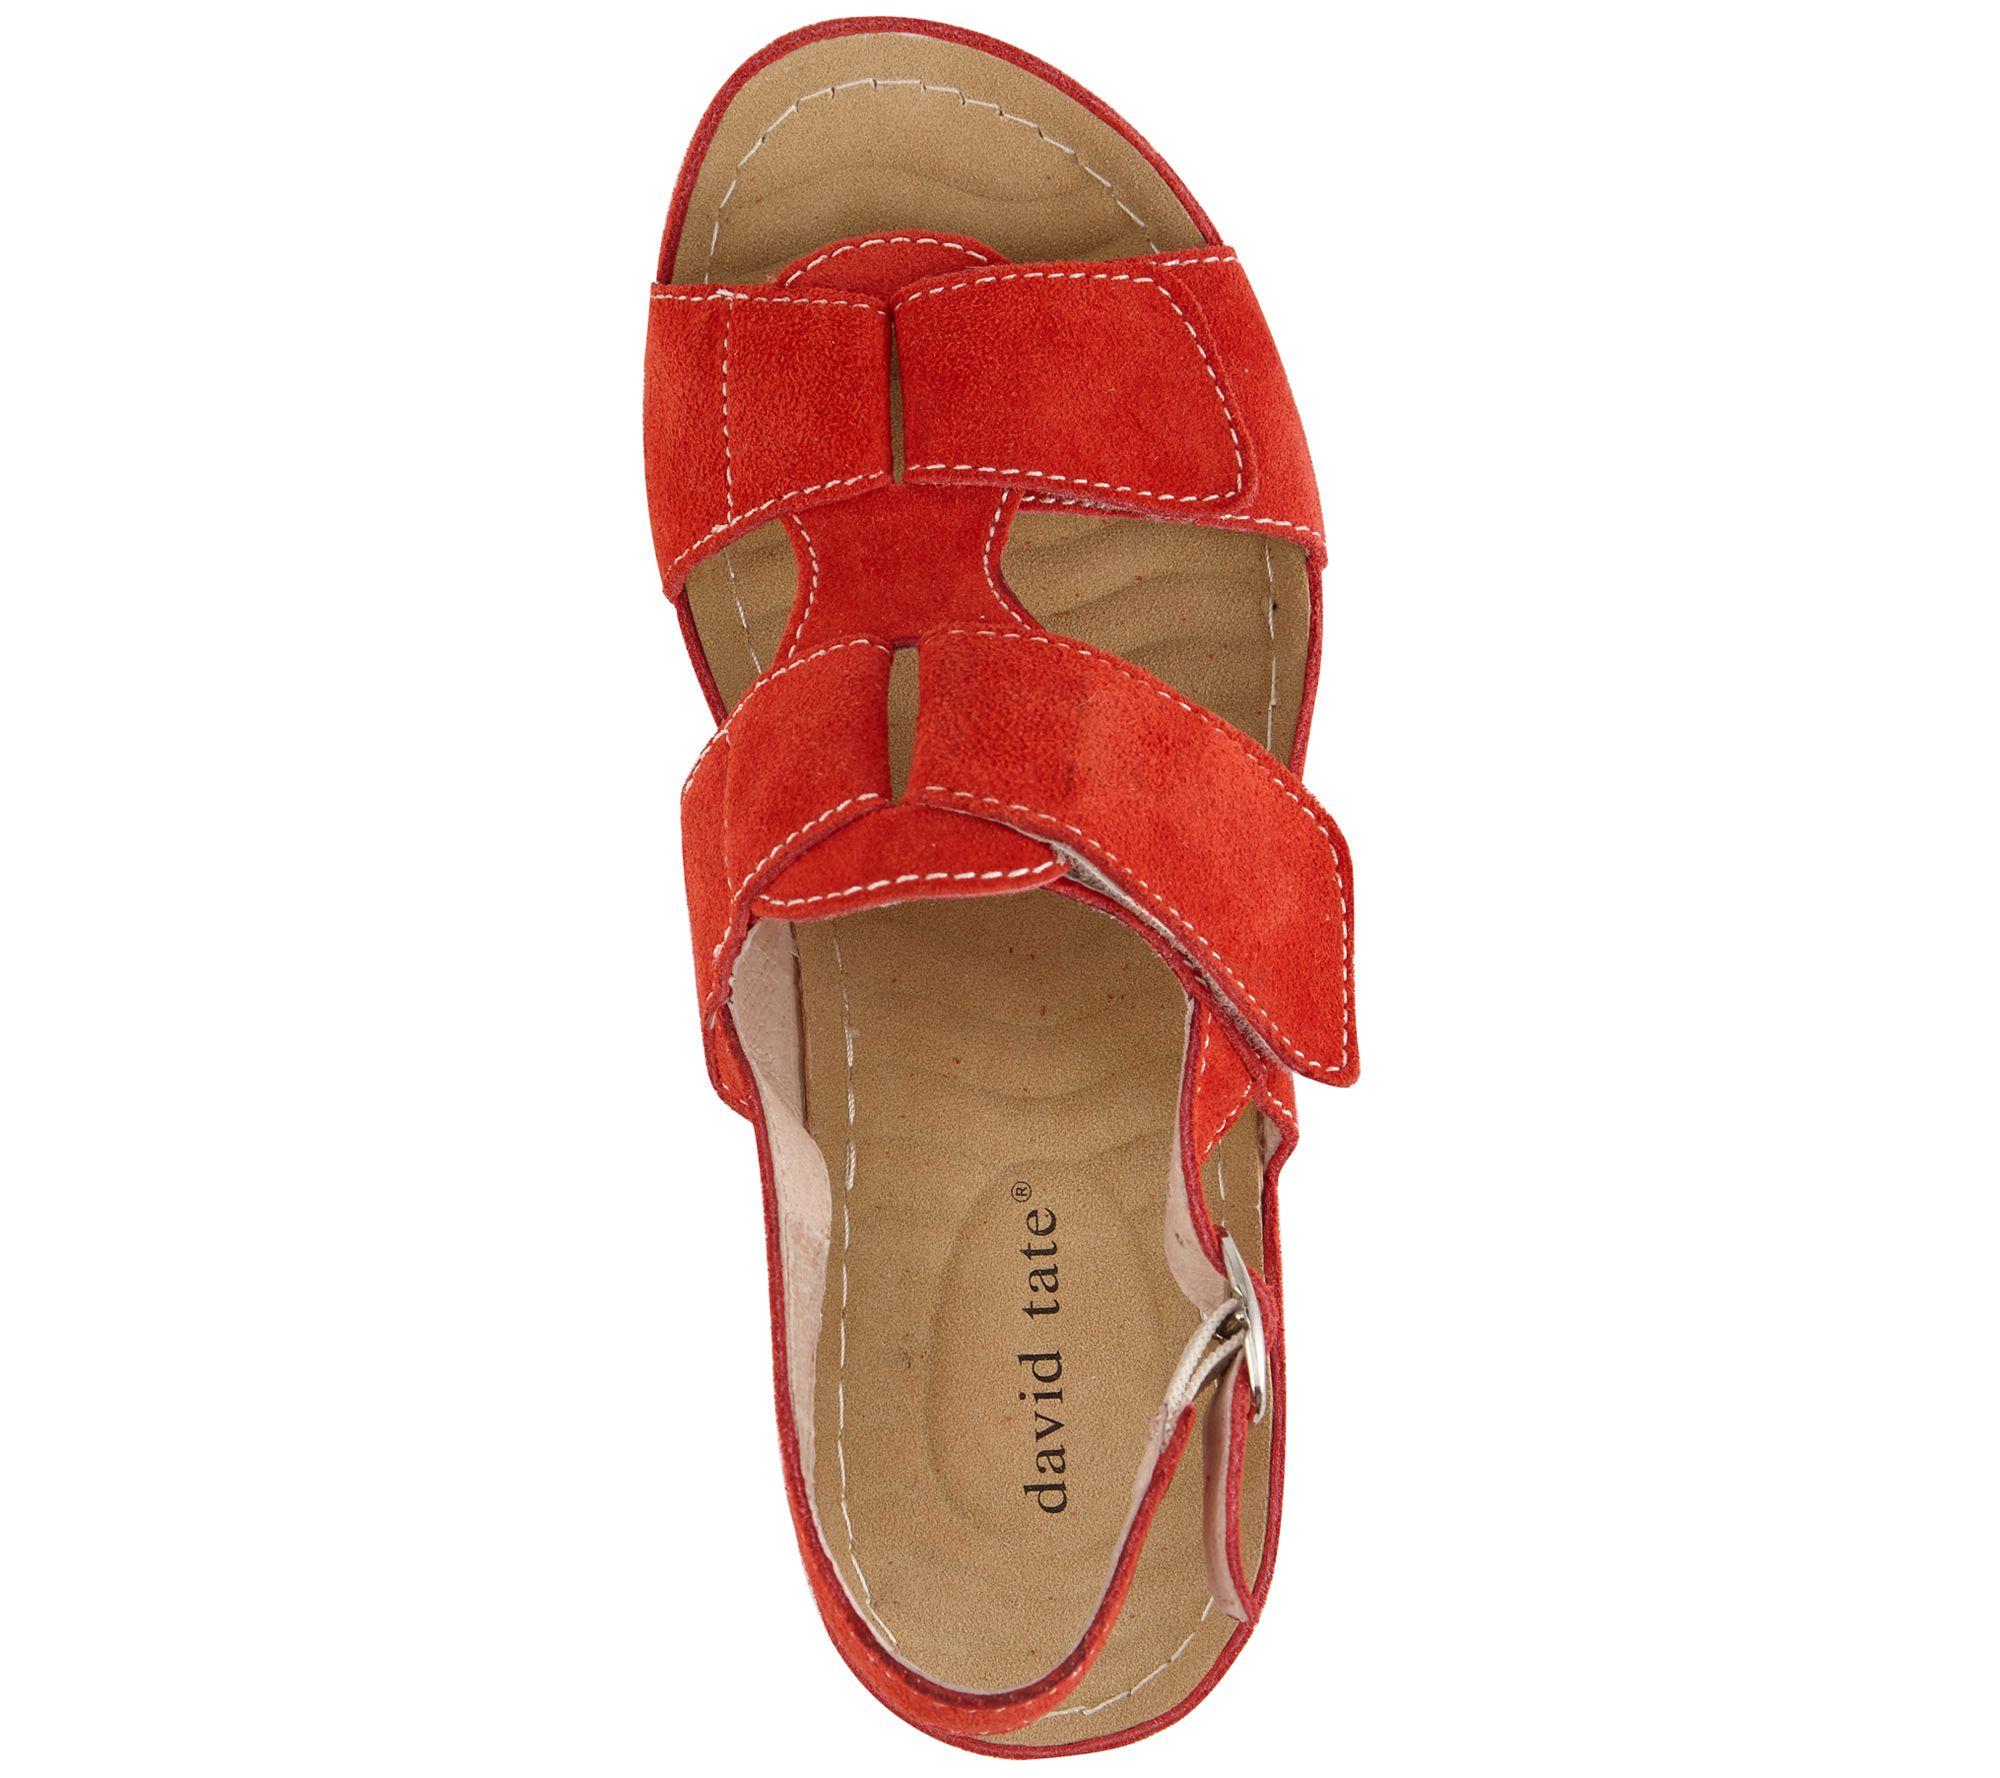 Sandals David Footbed — Tech Wave Tate Casual Reba jA354LR